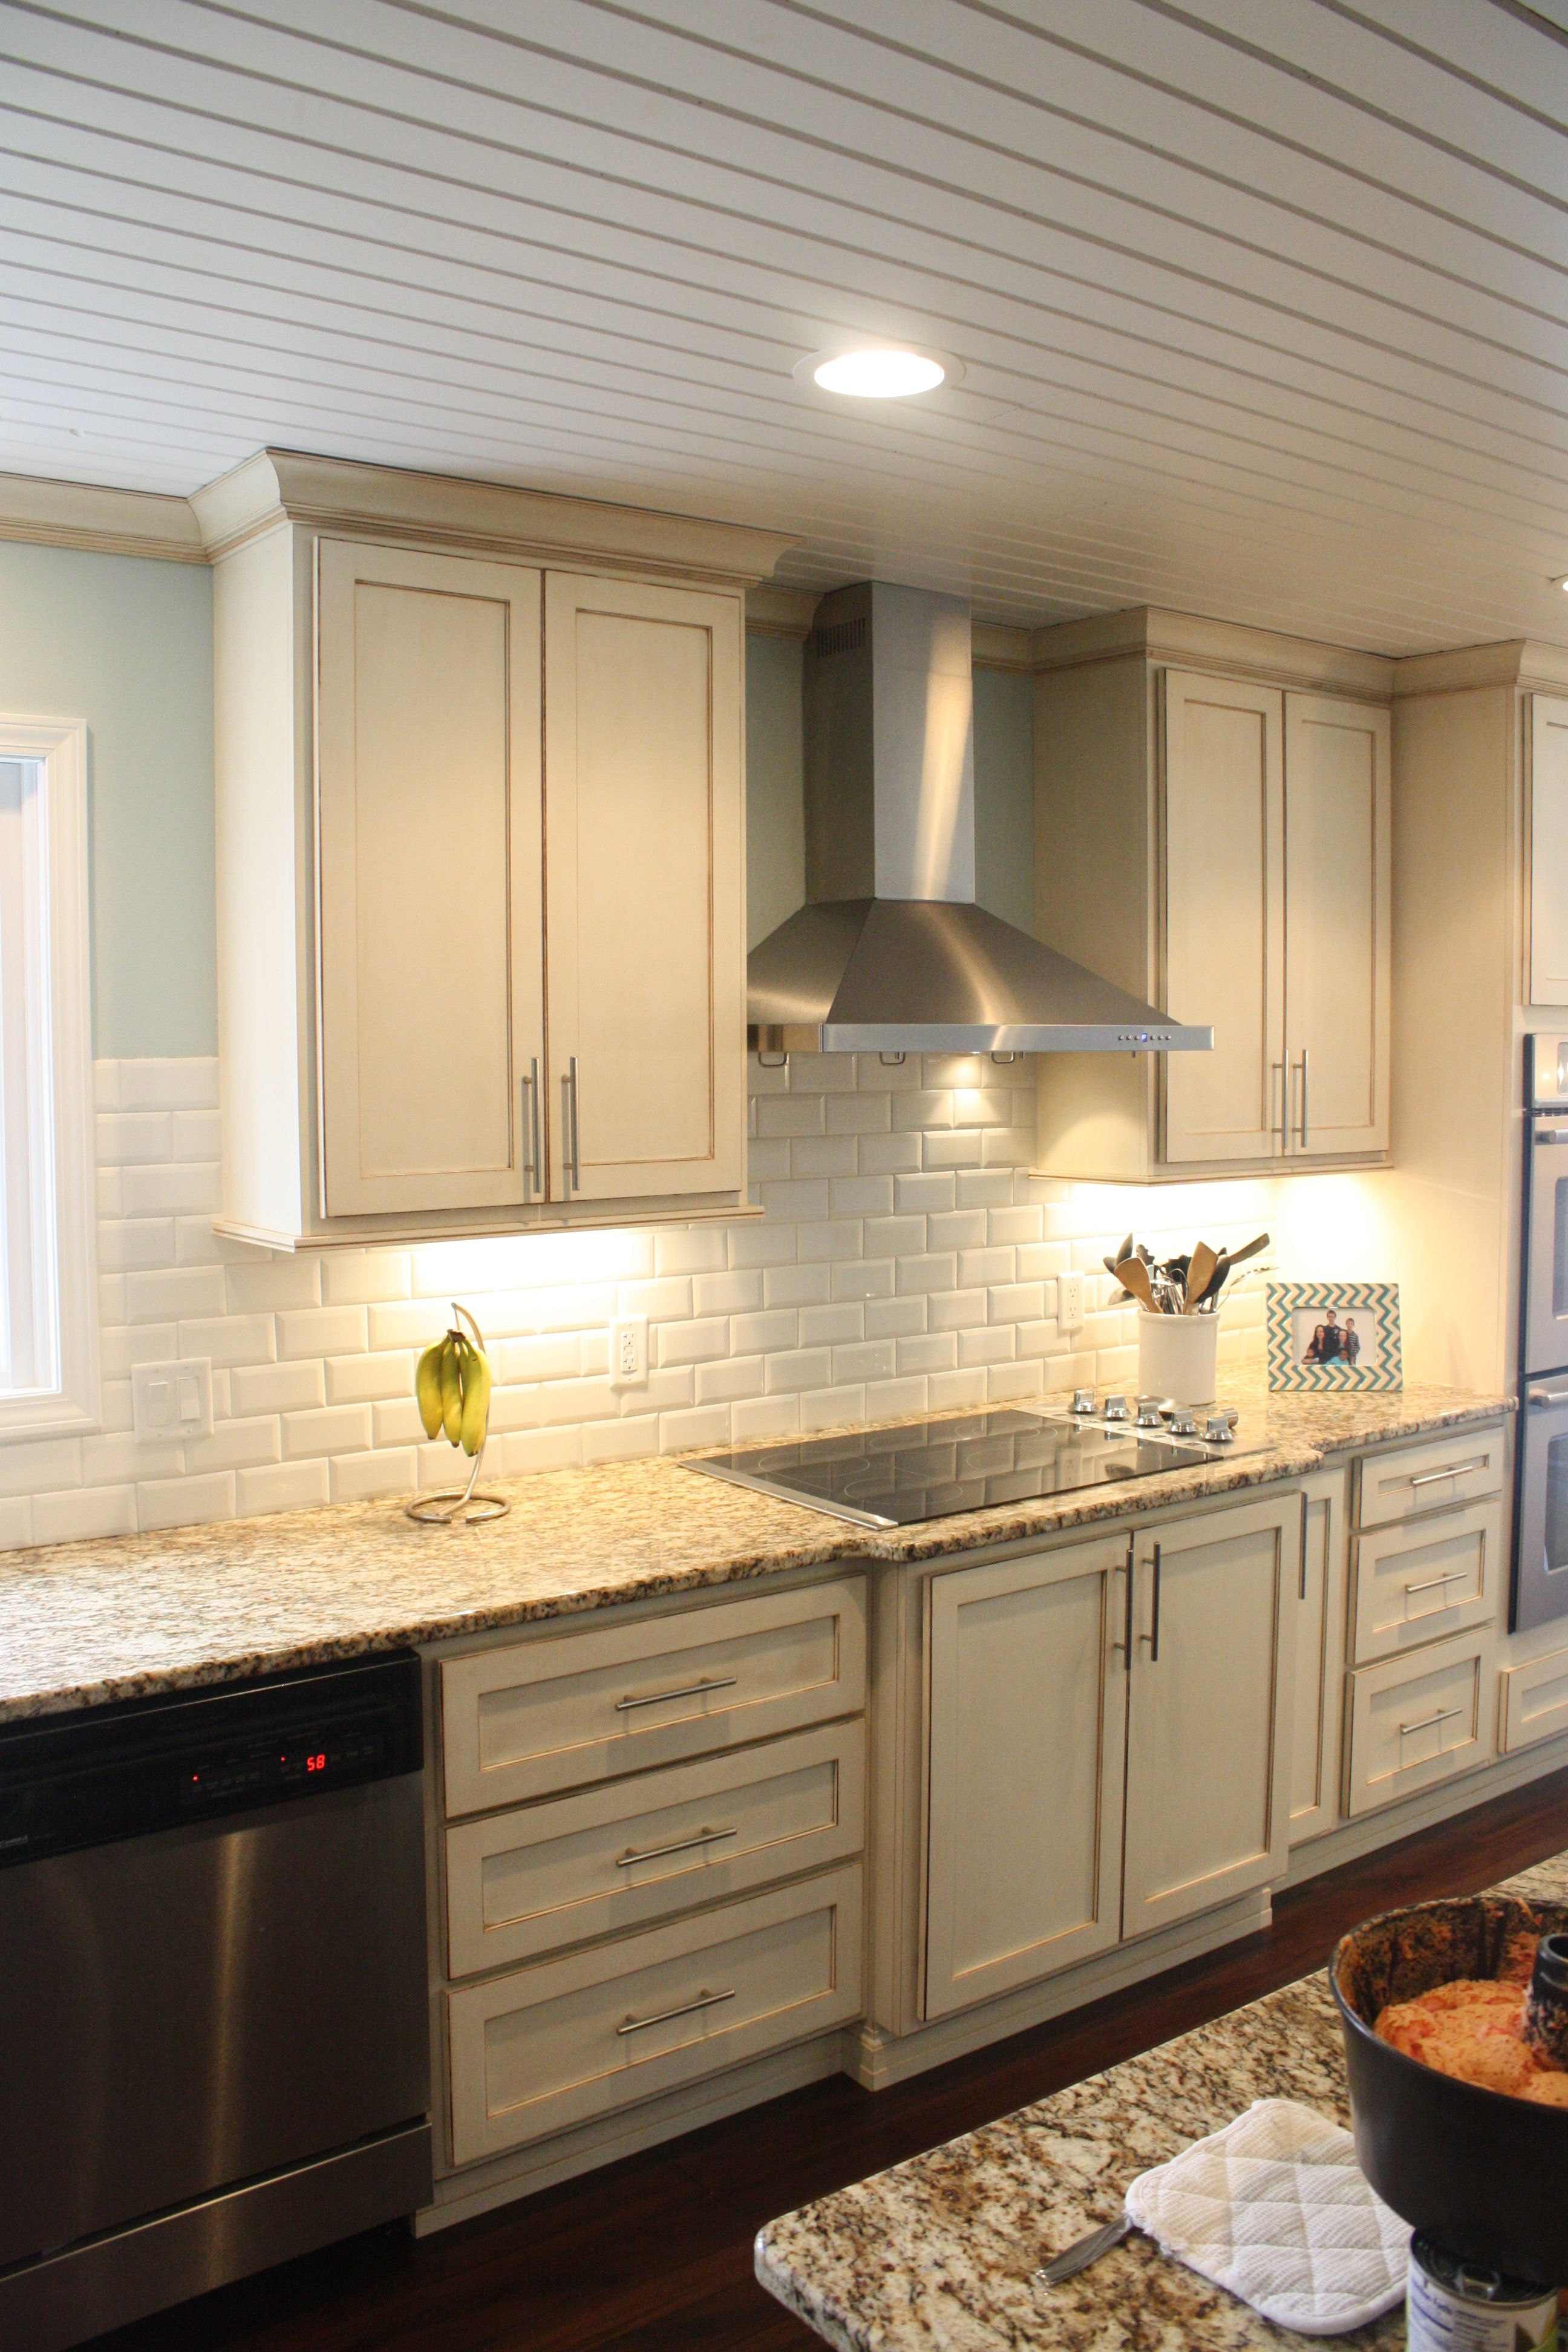 ceiling fan subway kitchen backsplash ideas subway tile backsplash my husband is a hard worker plank